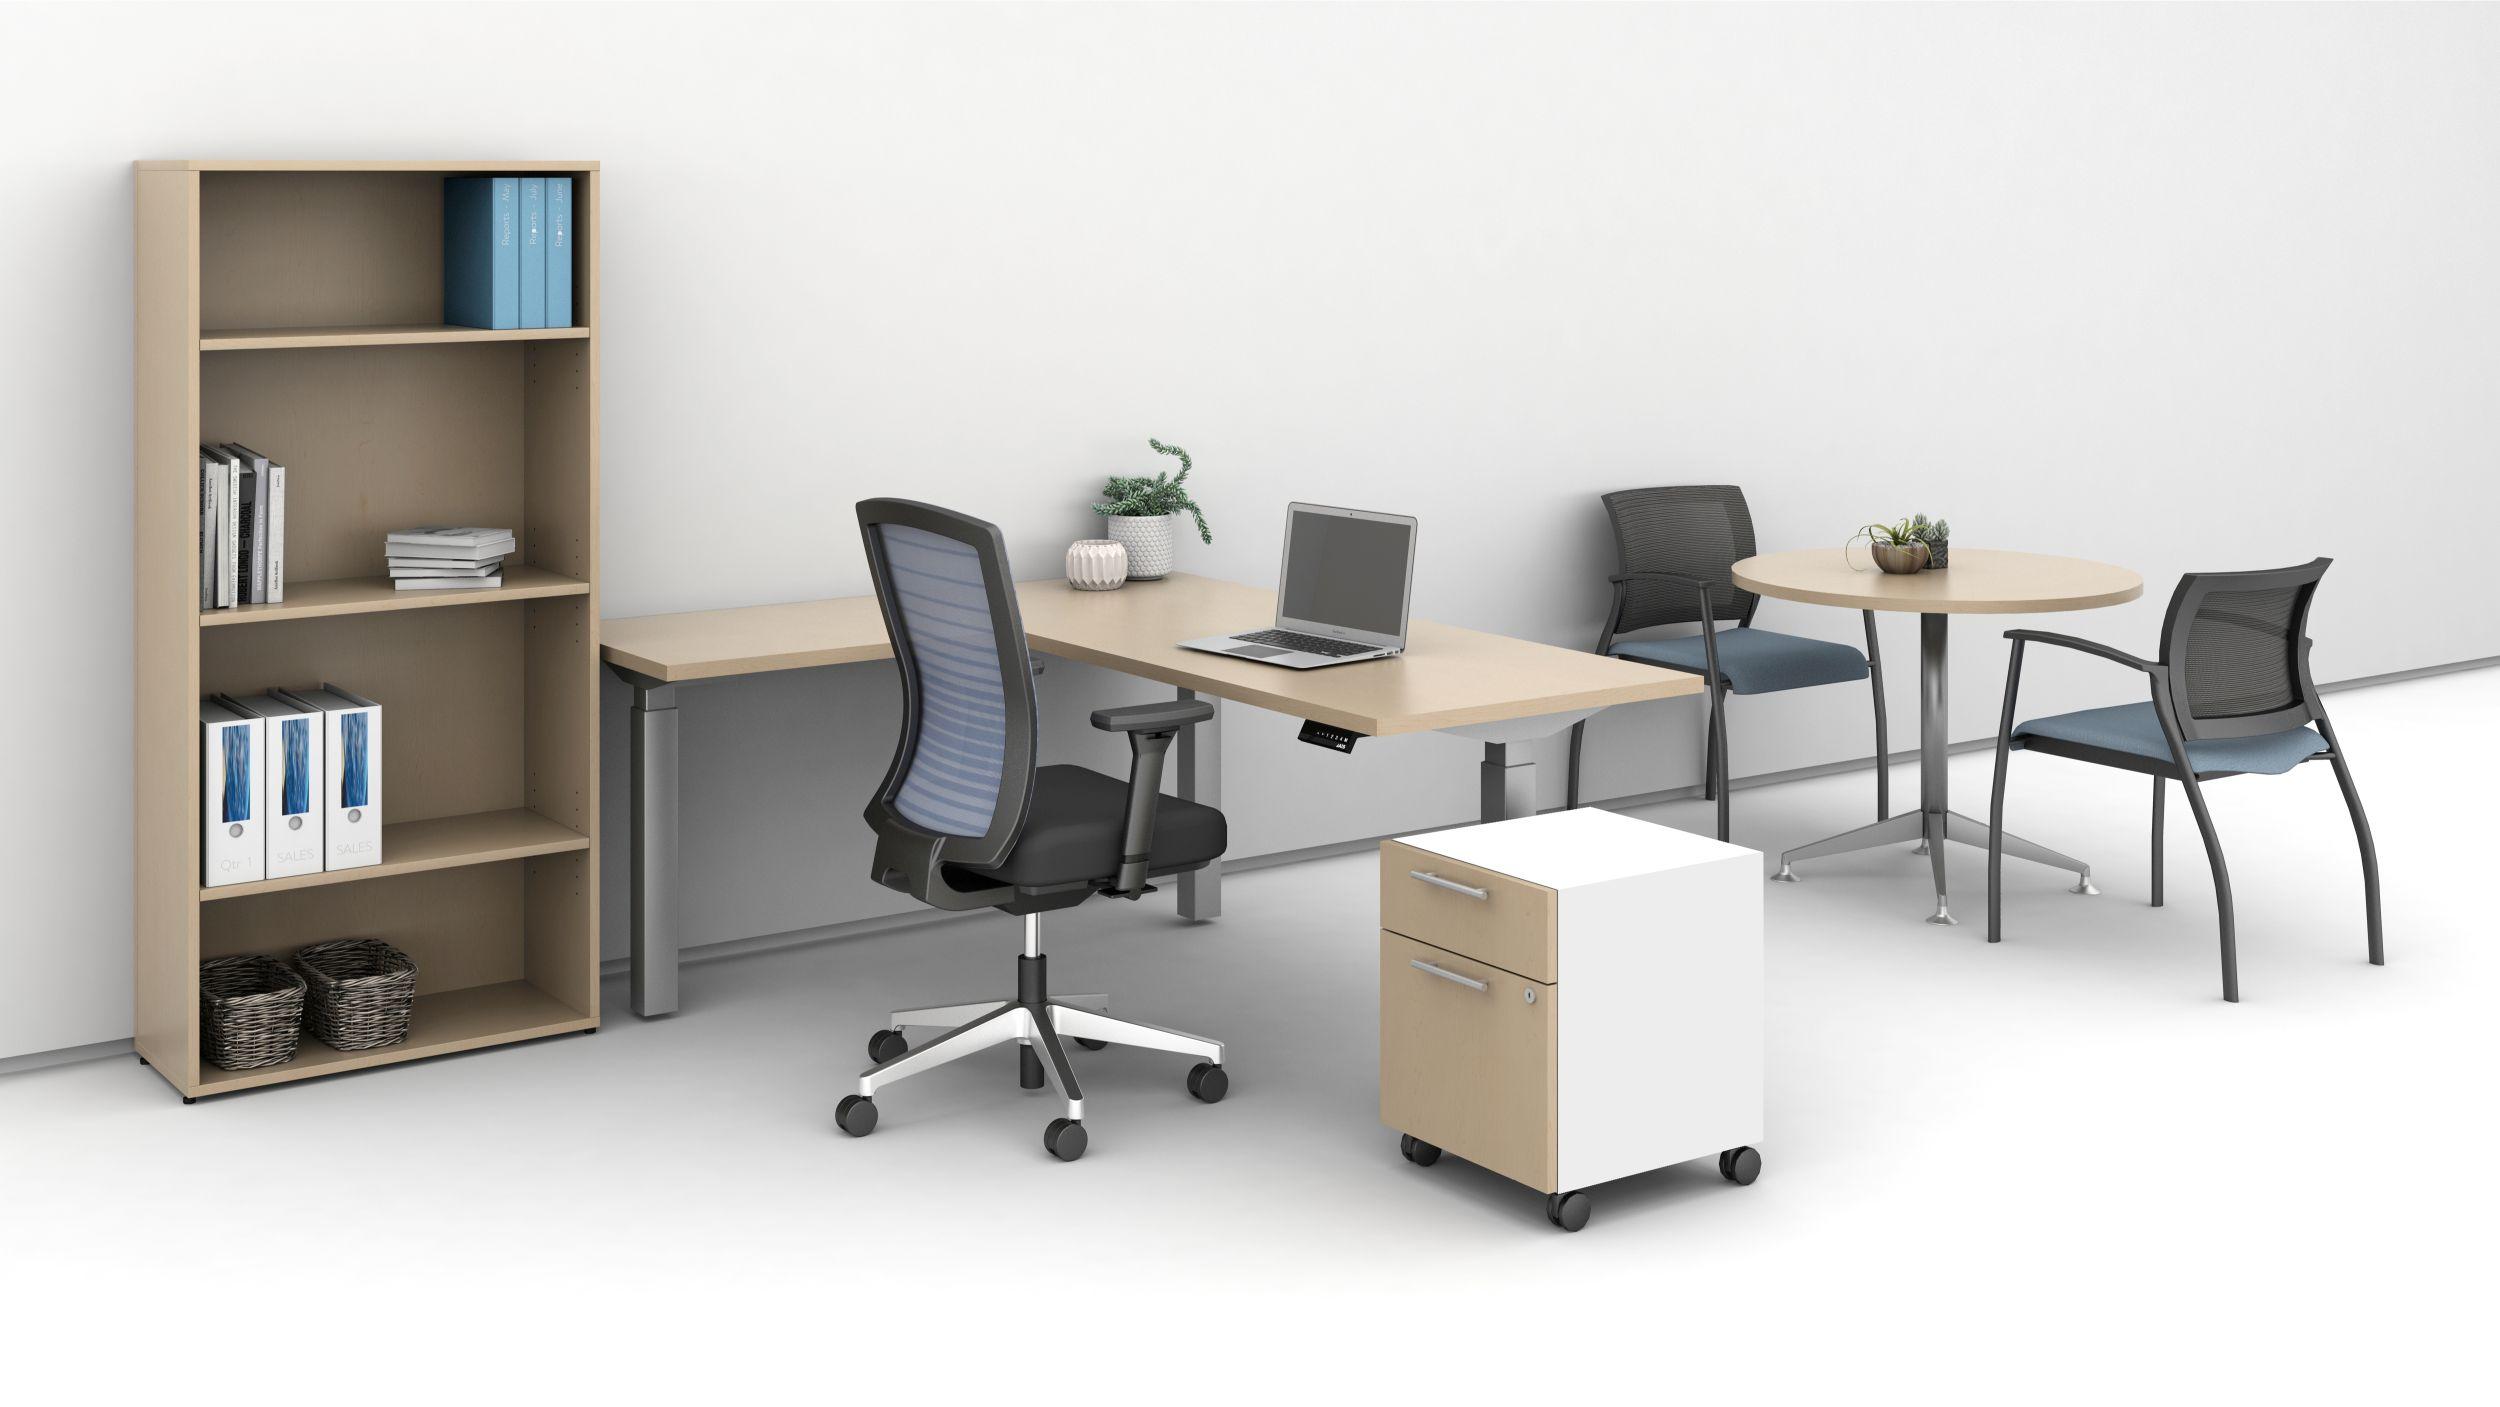 calibrate-casegood-ideastarter-3-small-private-office_md